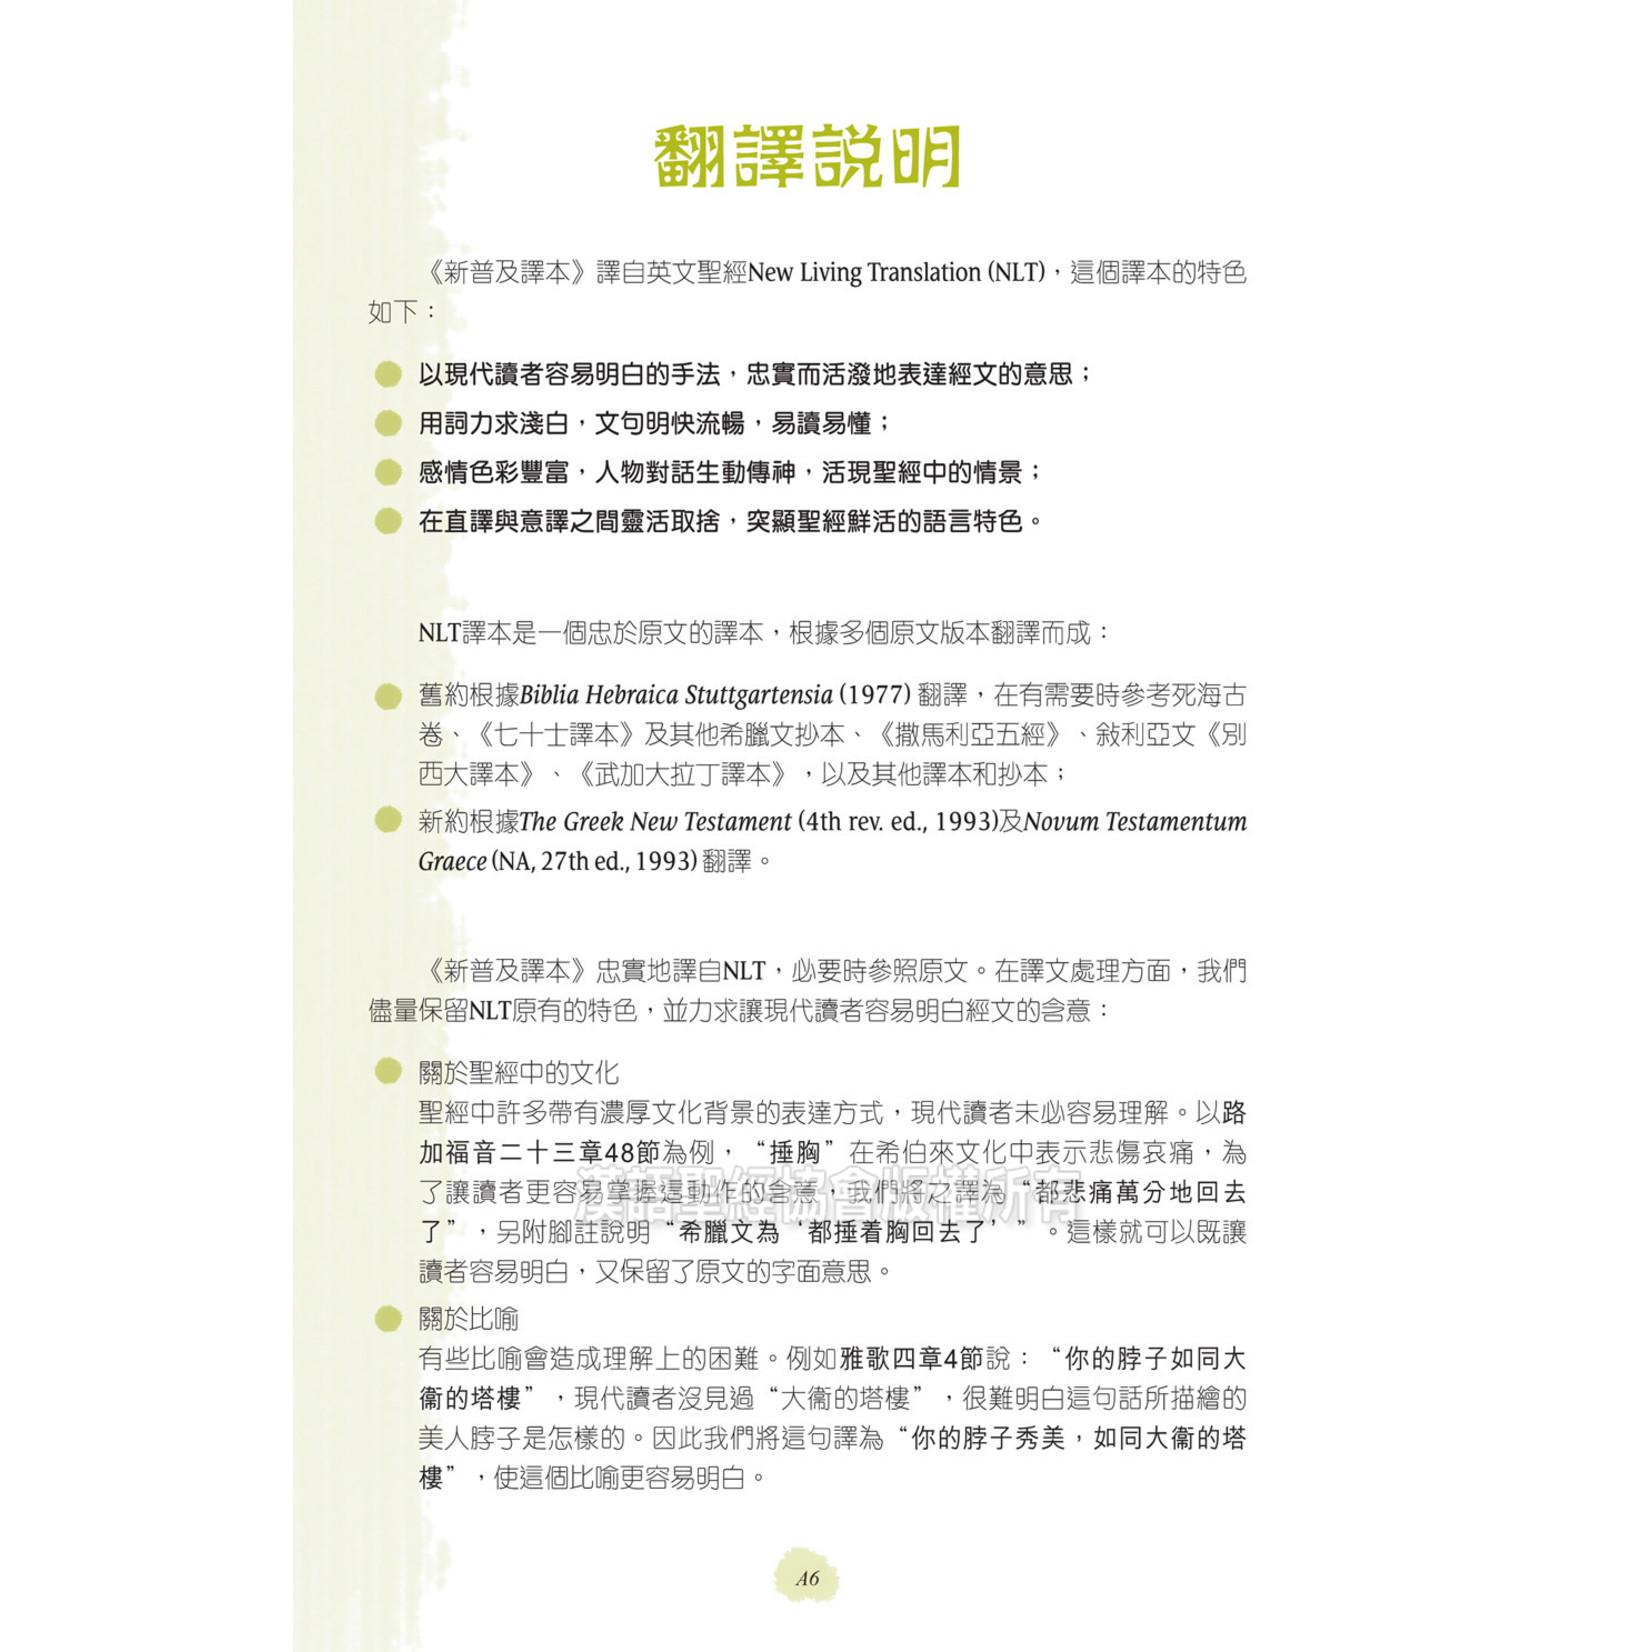 漢語聖經協會 Chinese Bible International 聖經.新普及譯本.硬面白邊.繁體 Holy Bible CNLT (Hardcover) Traditional Chinese